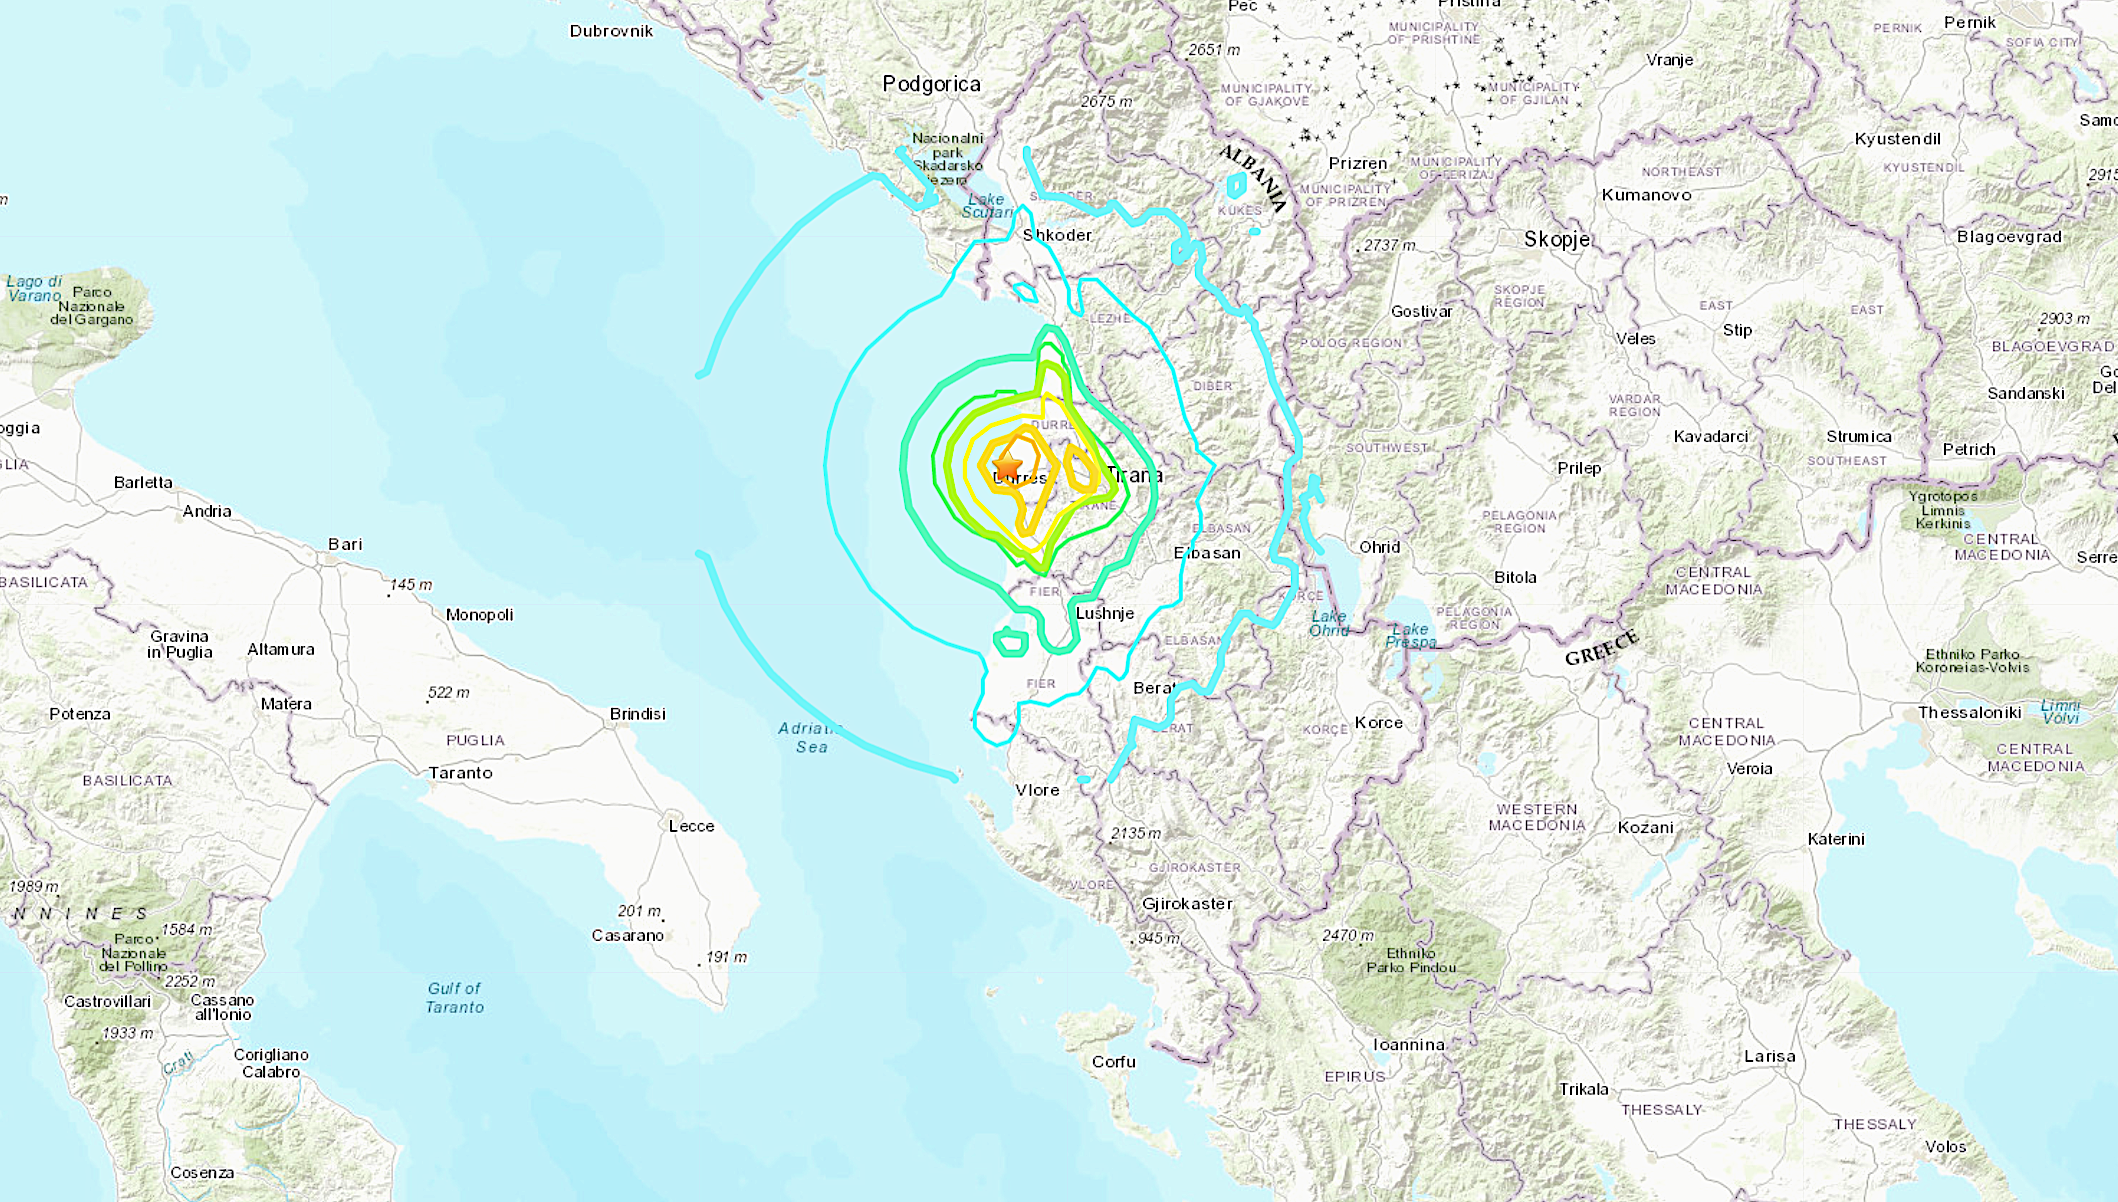 Cars crushed in Albania following powerful 5.6-magnitude earthquake